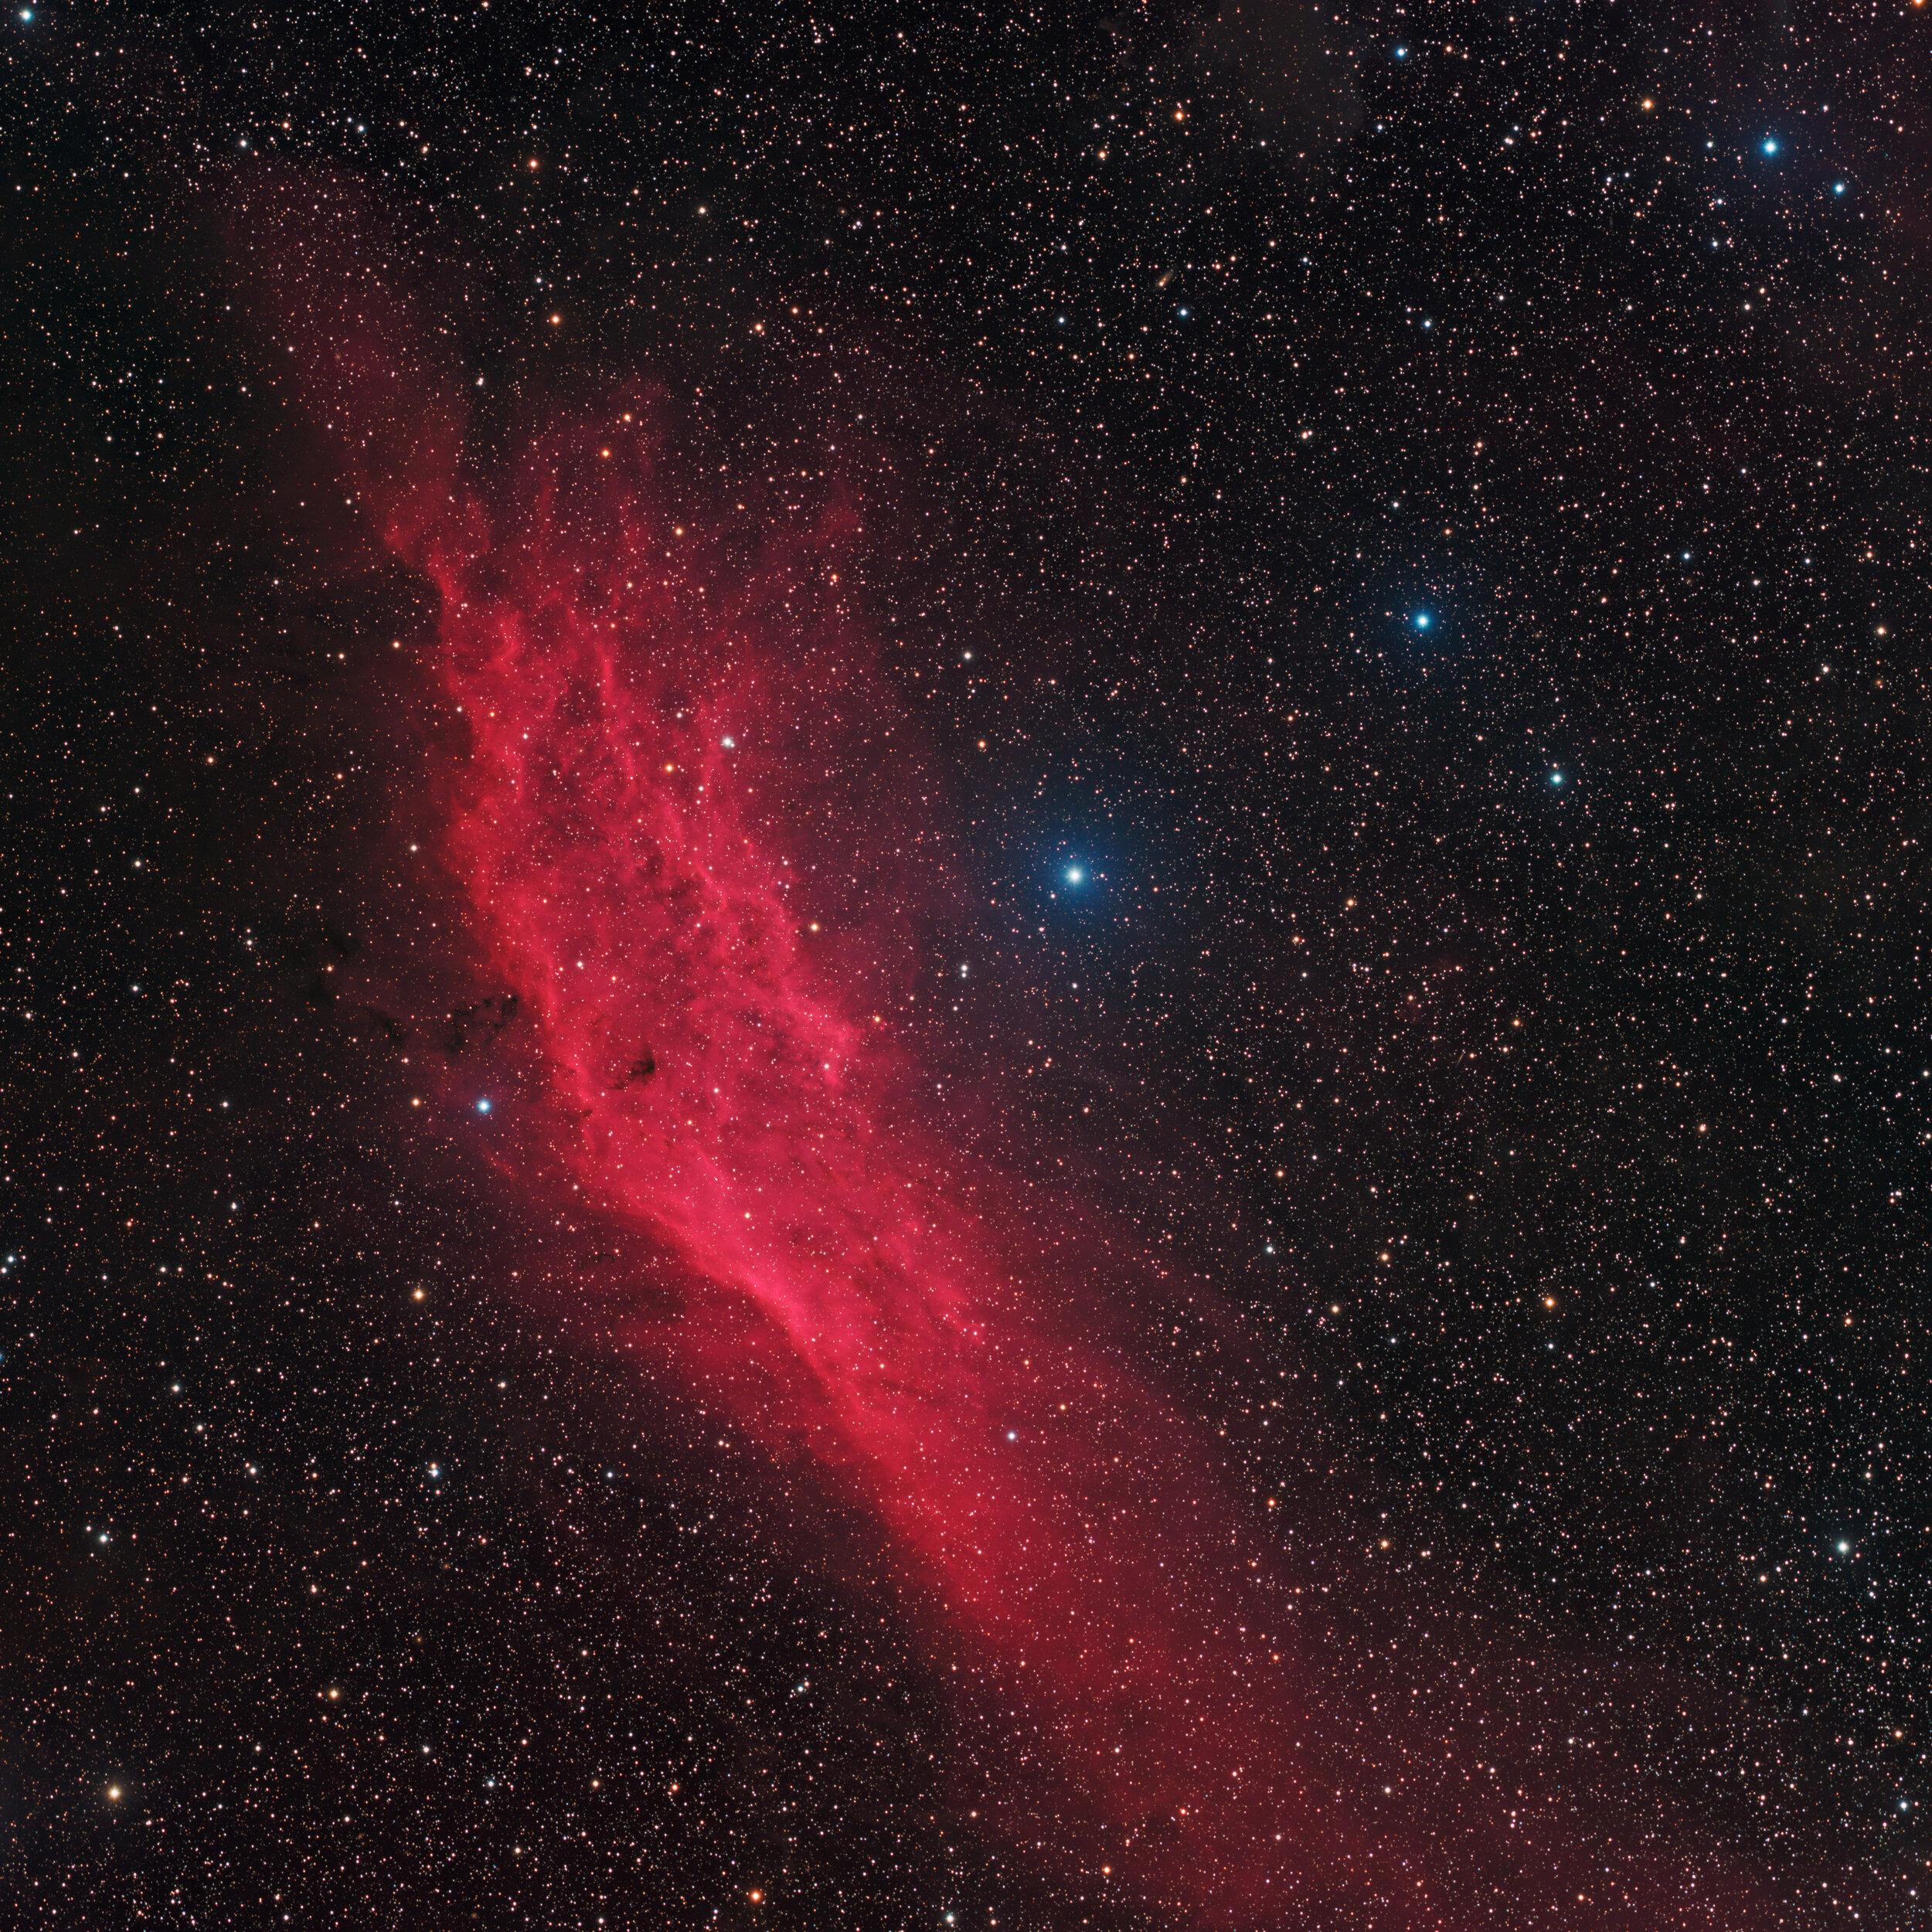 California Nebula NGC 1499 - Astrophotography Martin Rusterholz